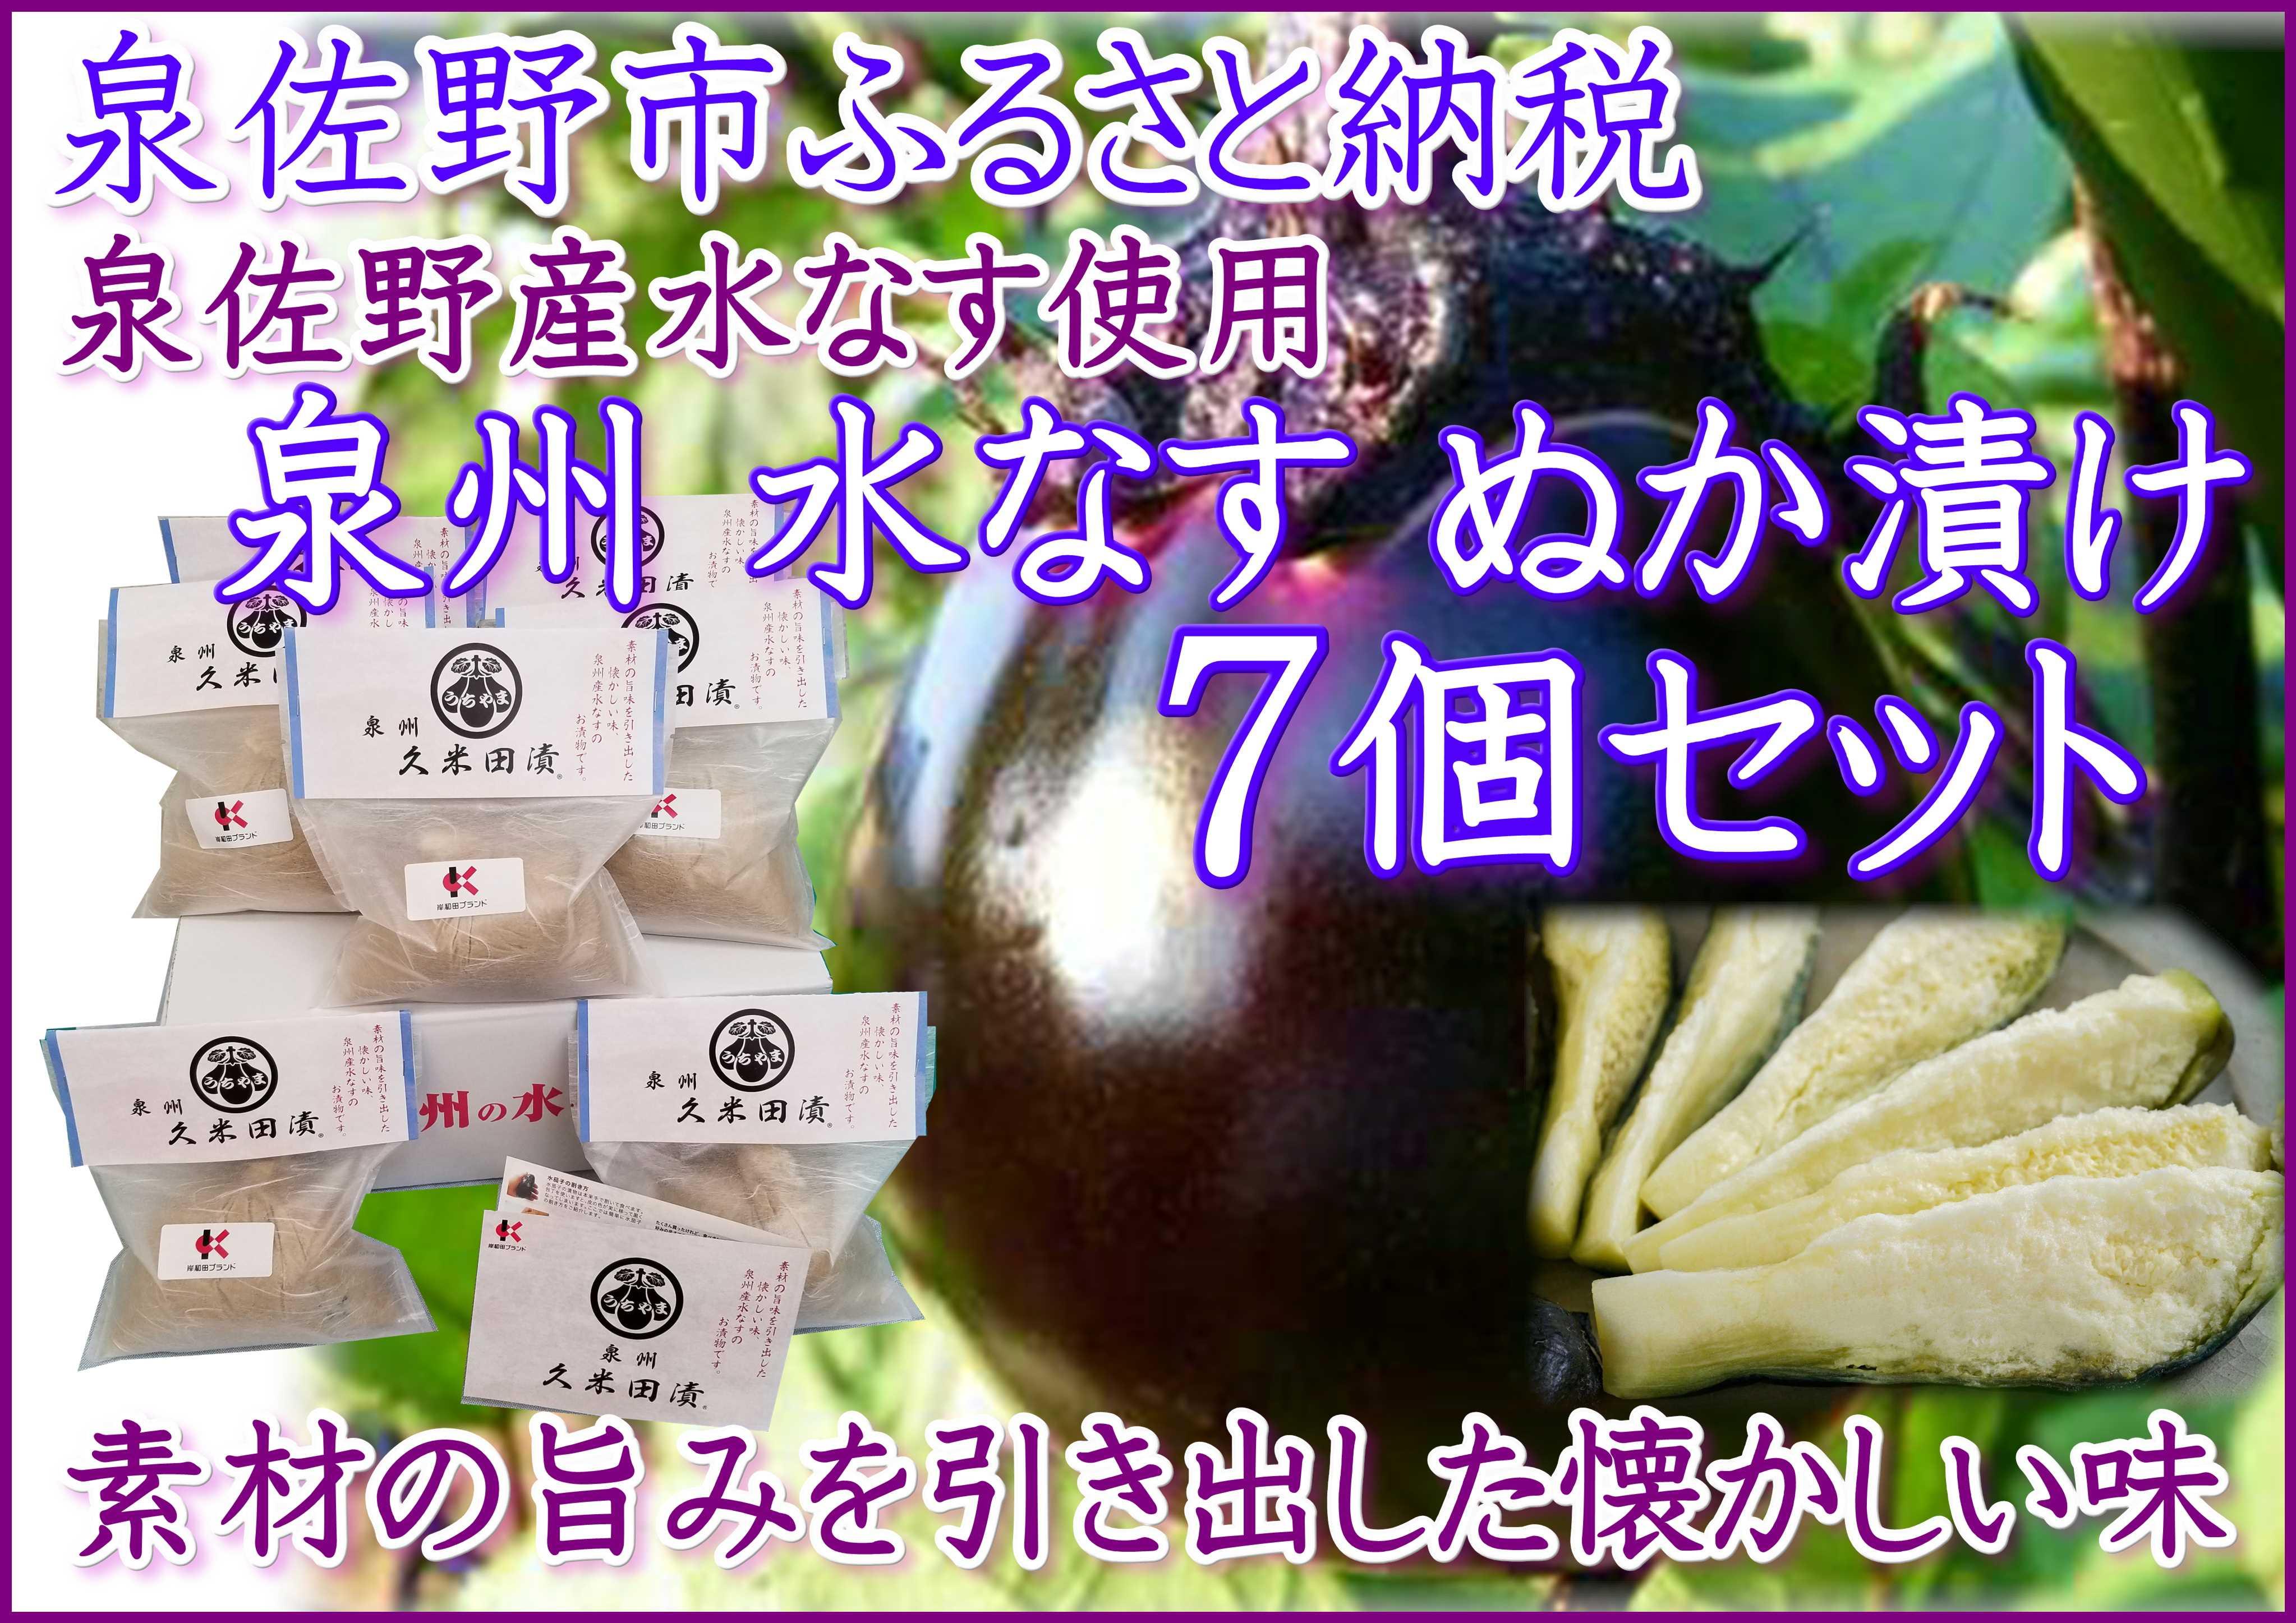 010B502 水なすぬか漬け「泉州久米田漬け」(7個)